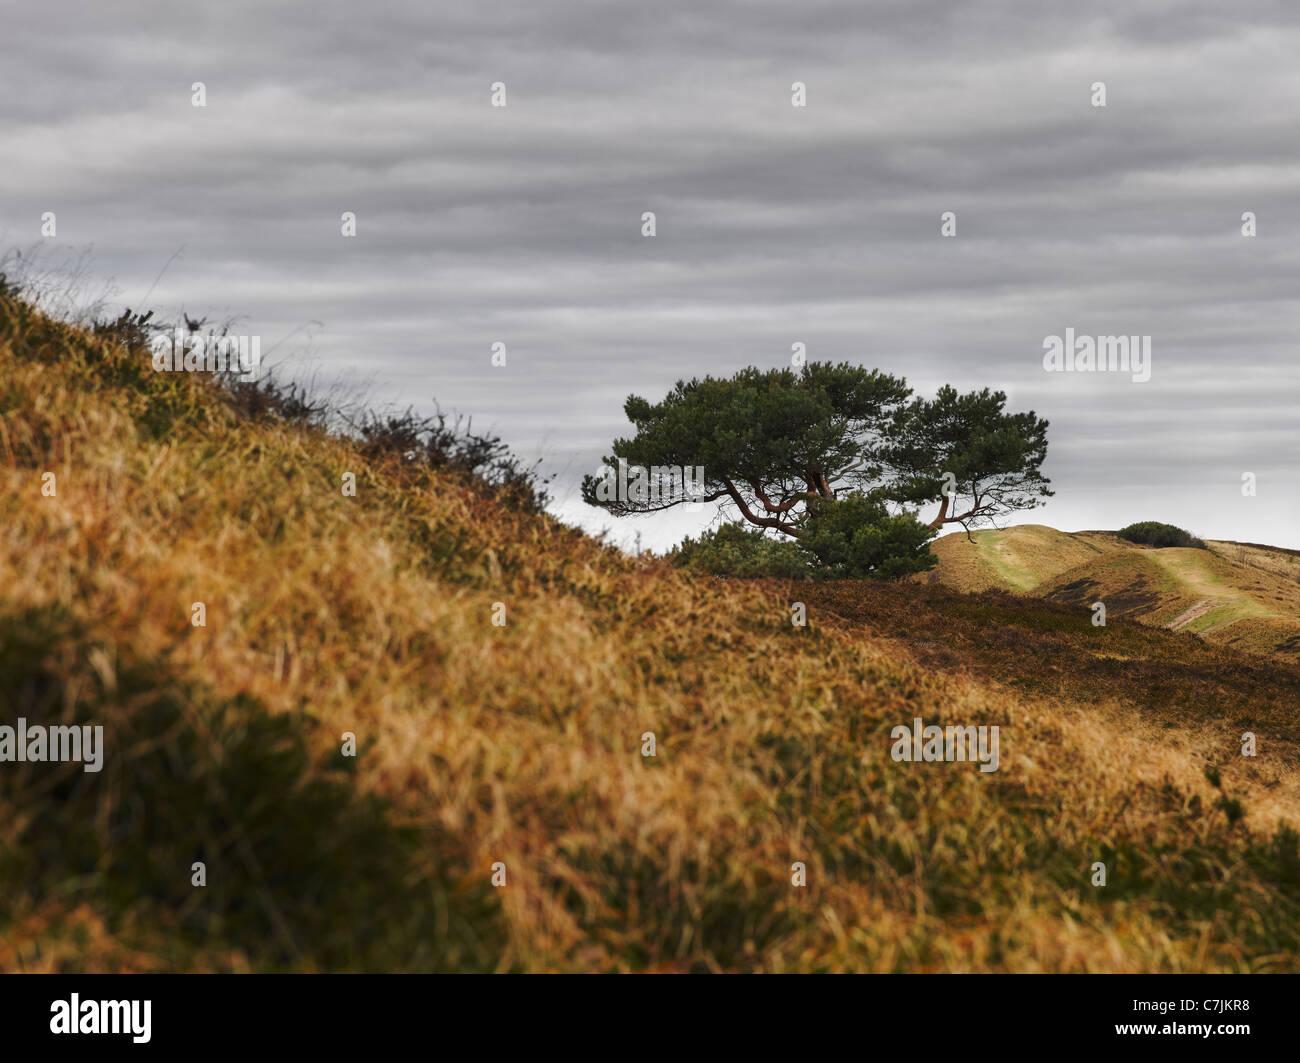 Tree on hillside in dry rural landscape - Stock Image